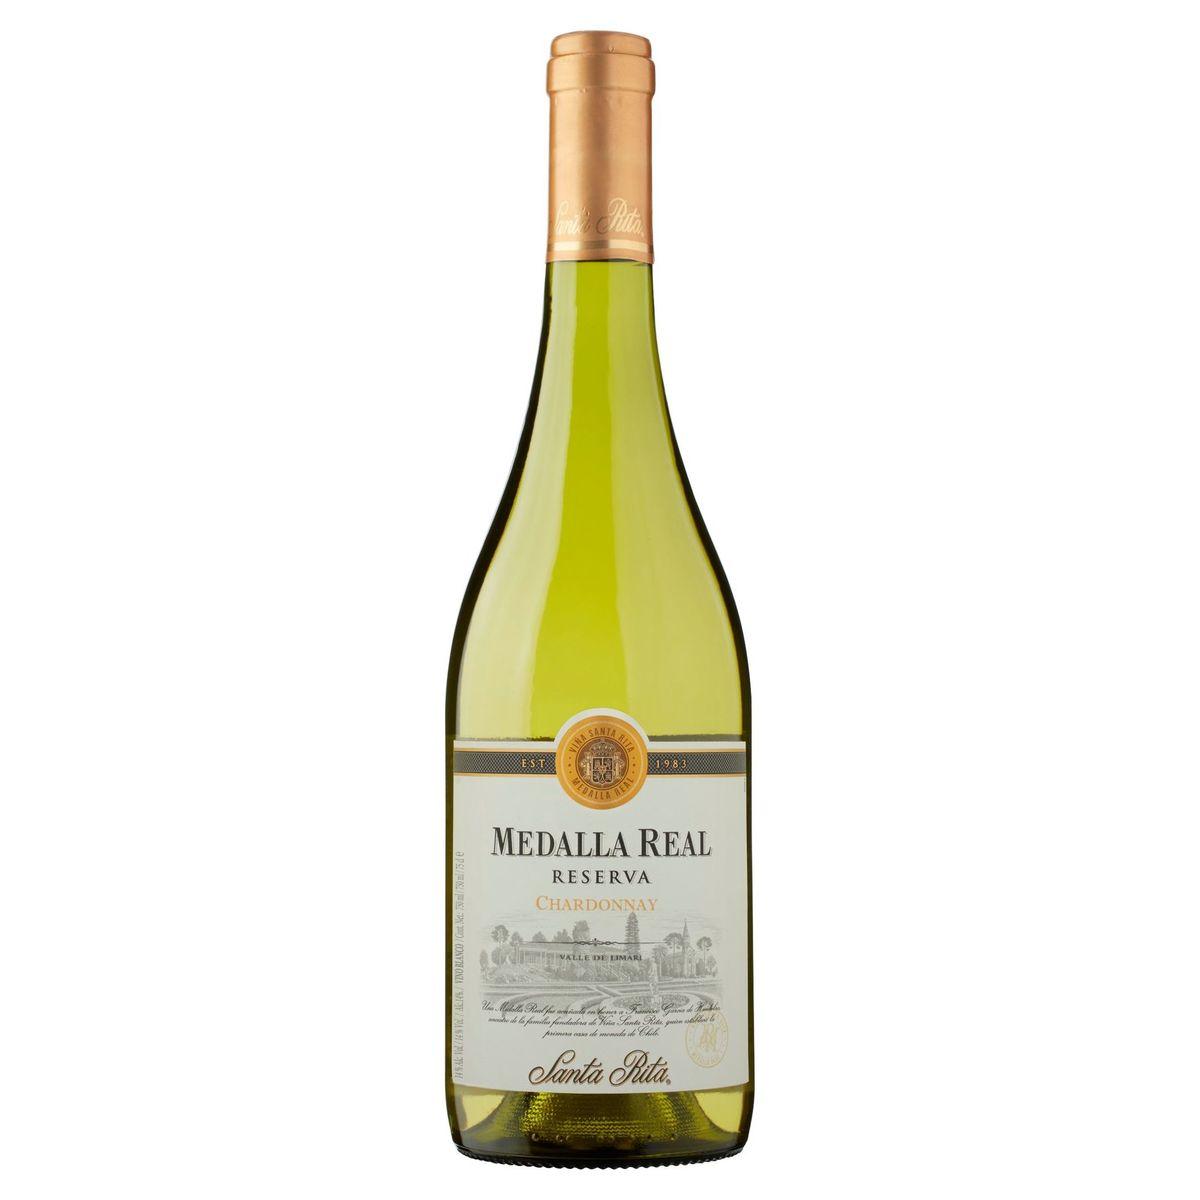 Santa Rita Medalla Real Reserve Chardonnay 750 ml